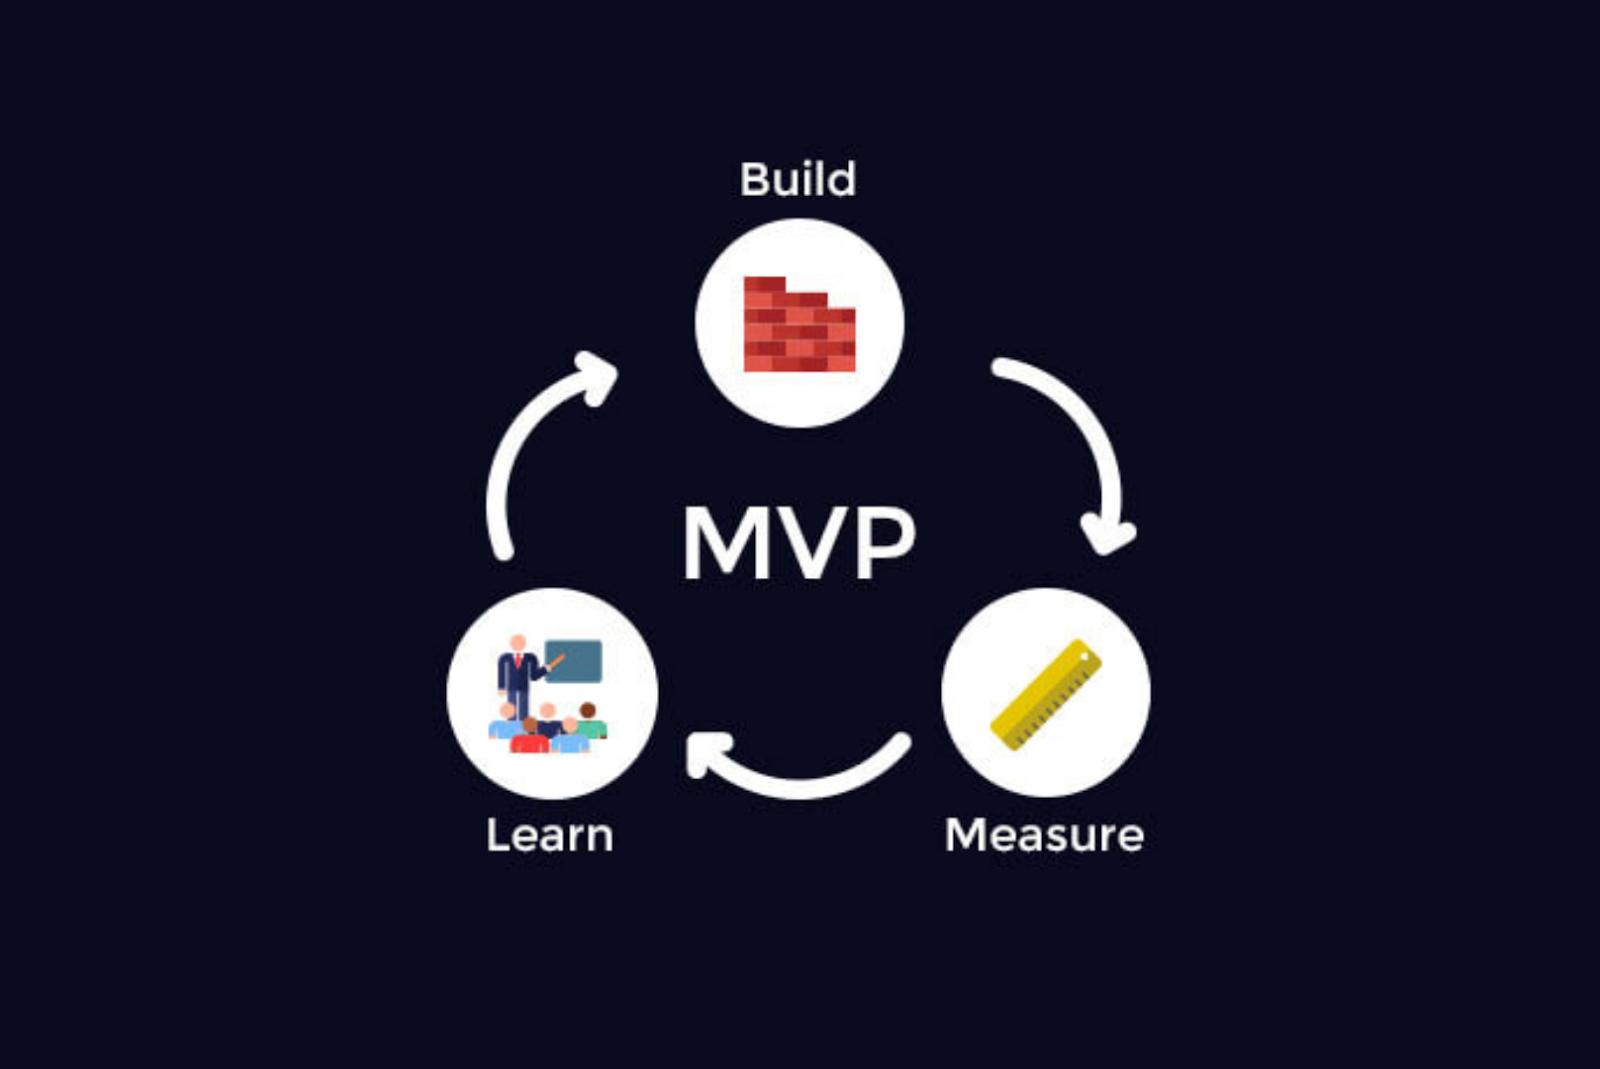 Building your MVP